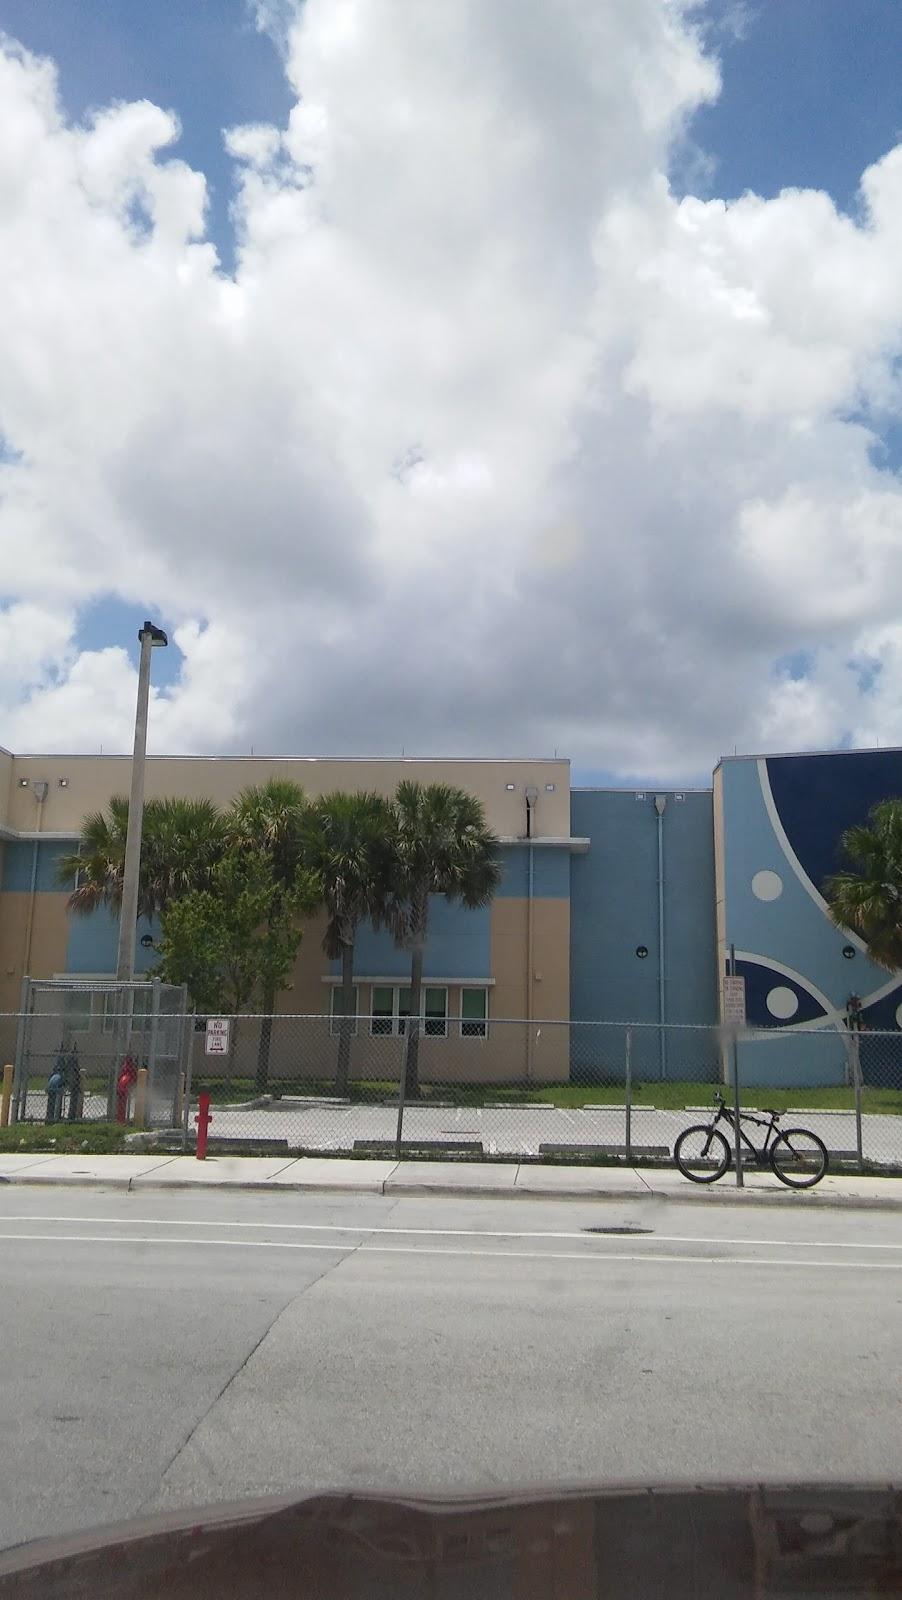 Southwest Miami Senior High School - school    Photo 2 of 5   Address: 8855 SW 50th Terrace, Miami, FL 33165, USA   Phone: (305) 274-0181